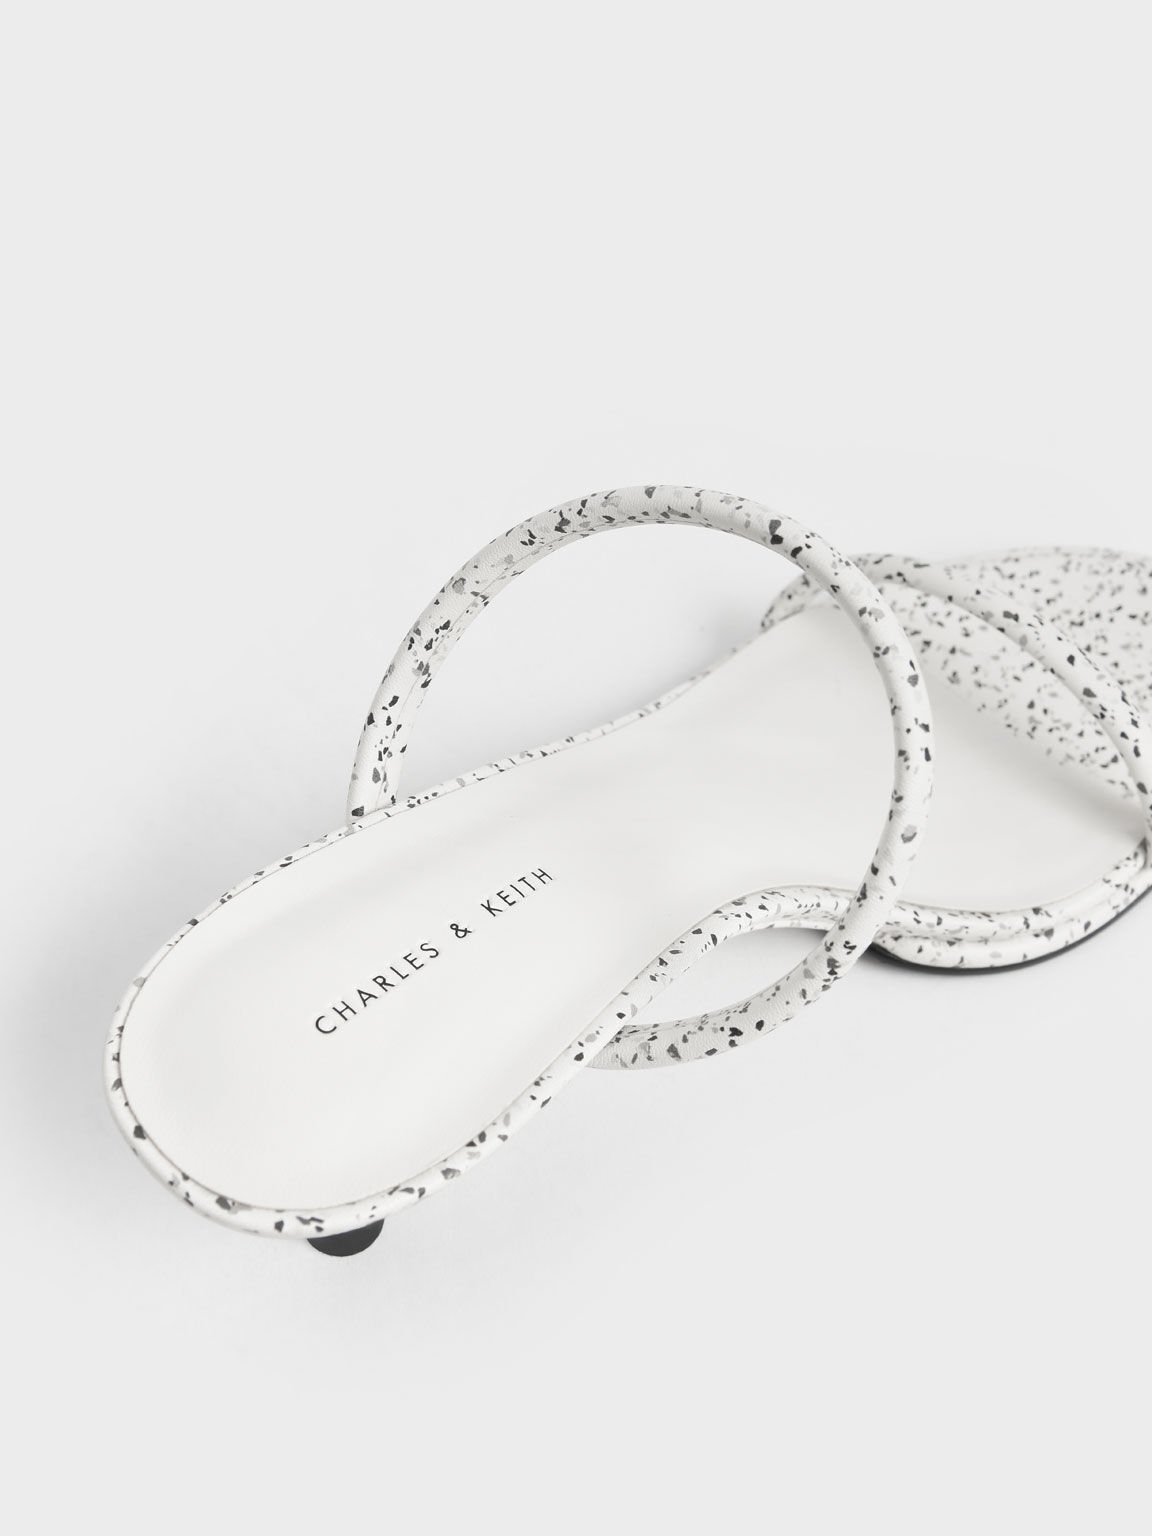 Lucile Printed Stiletto Calf Boots, Multi, hi-res